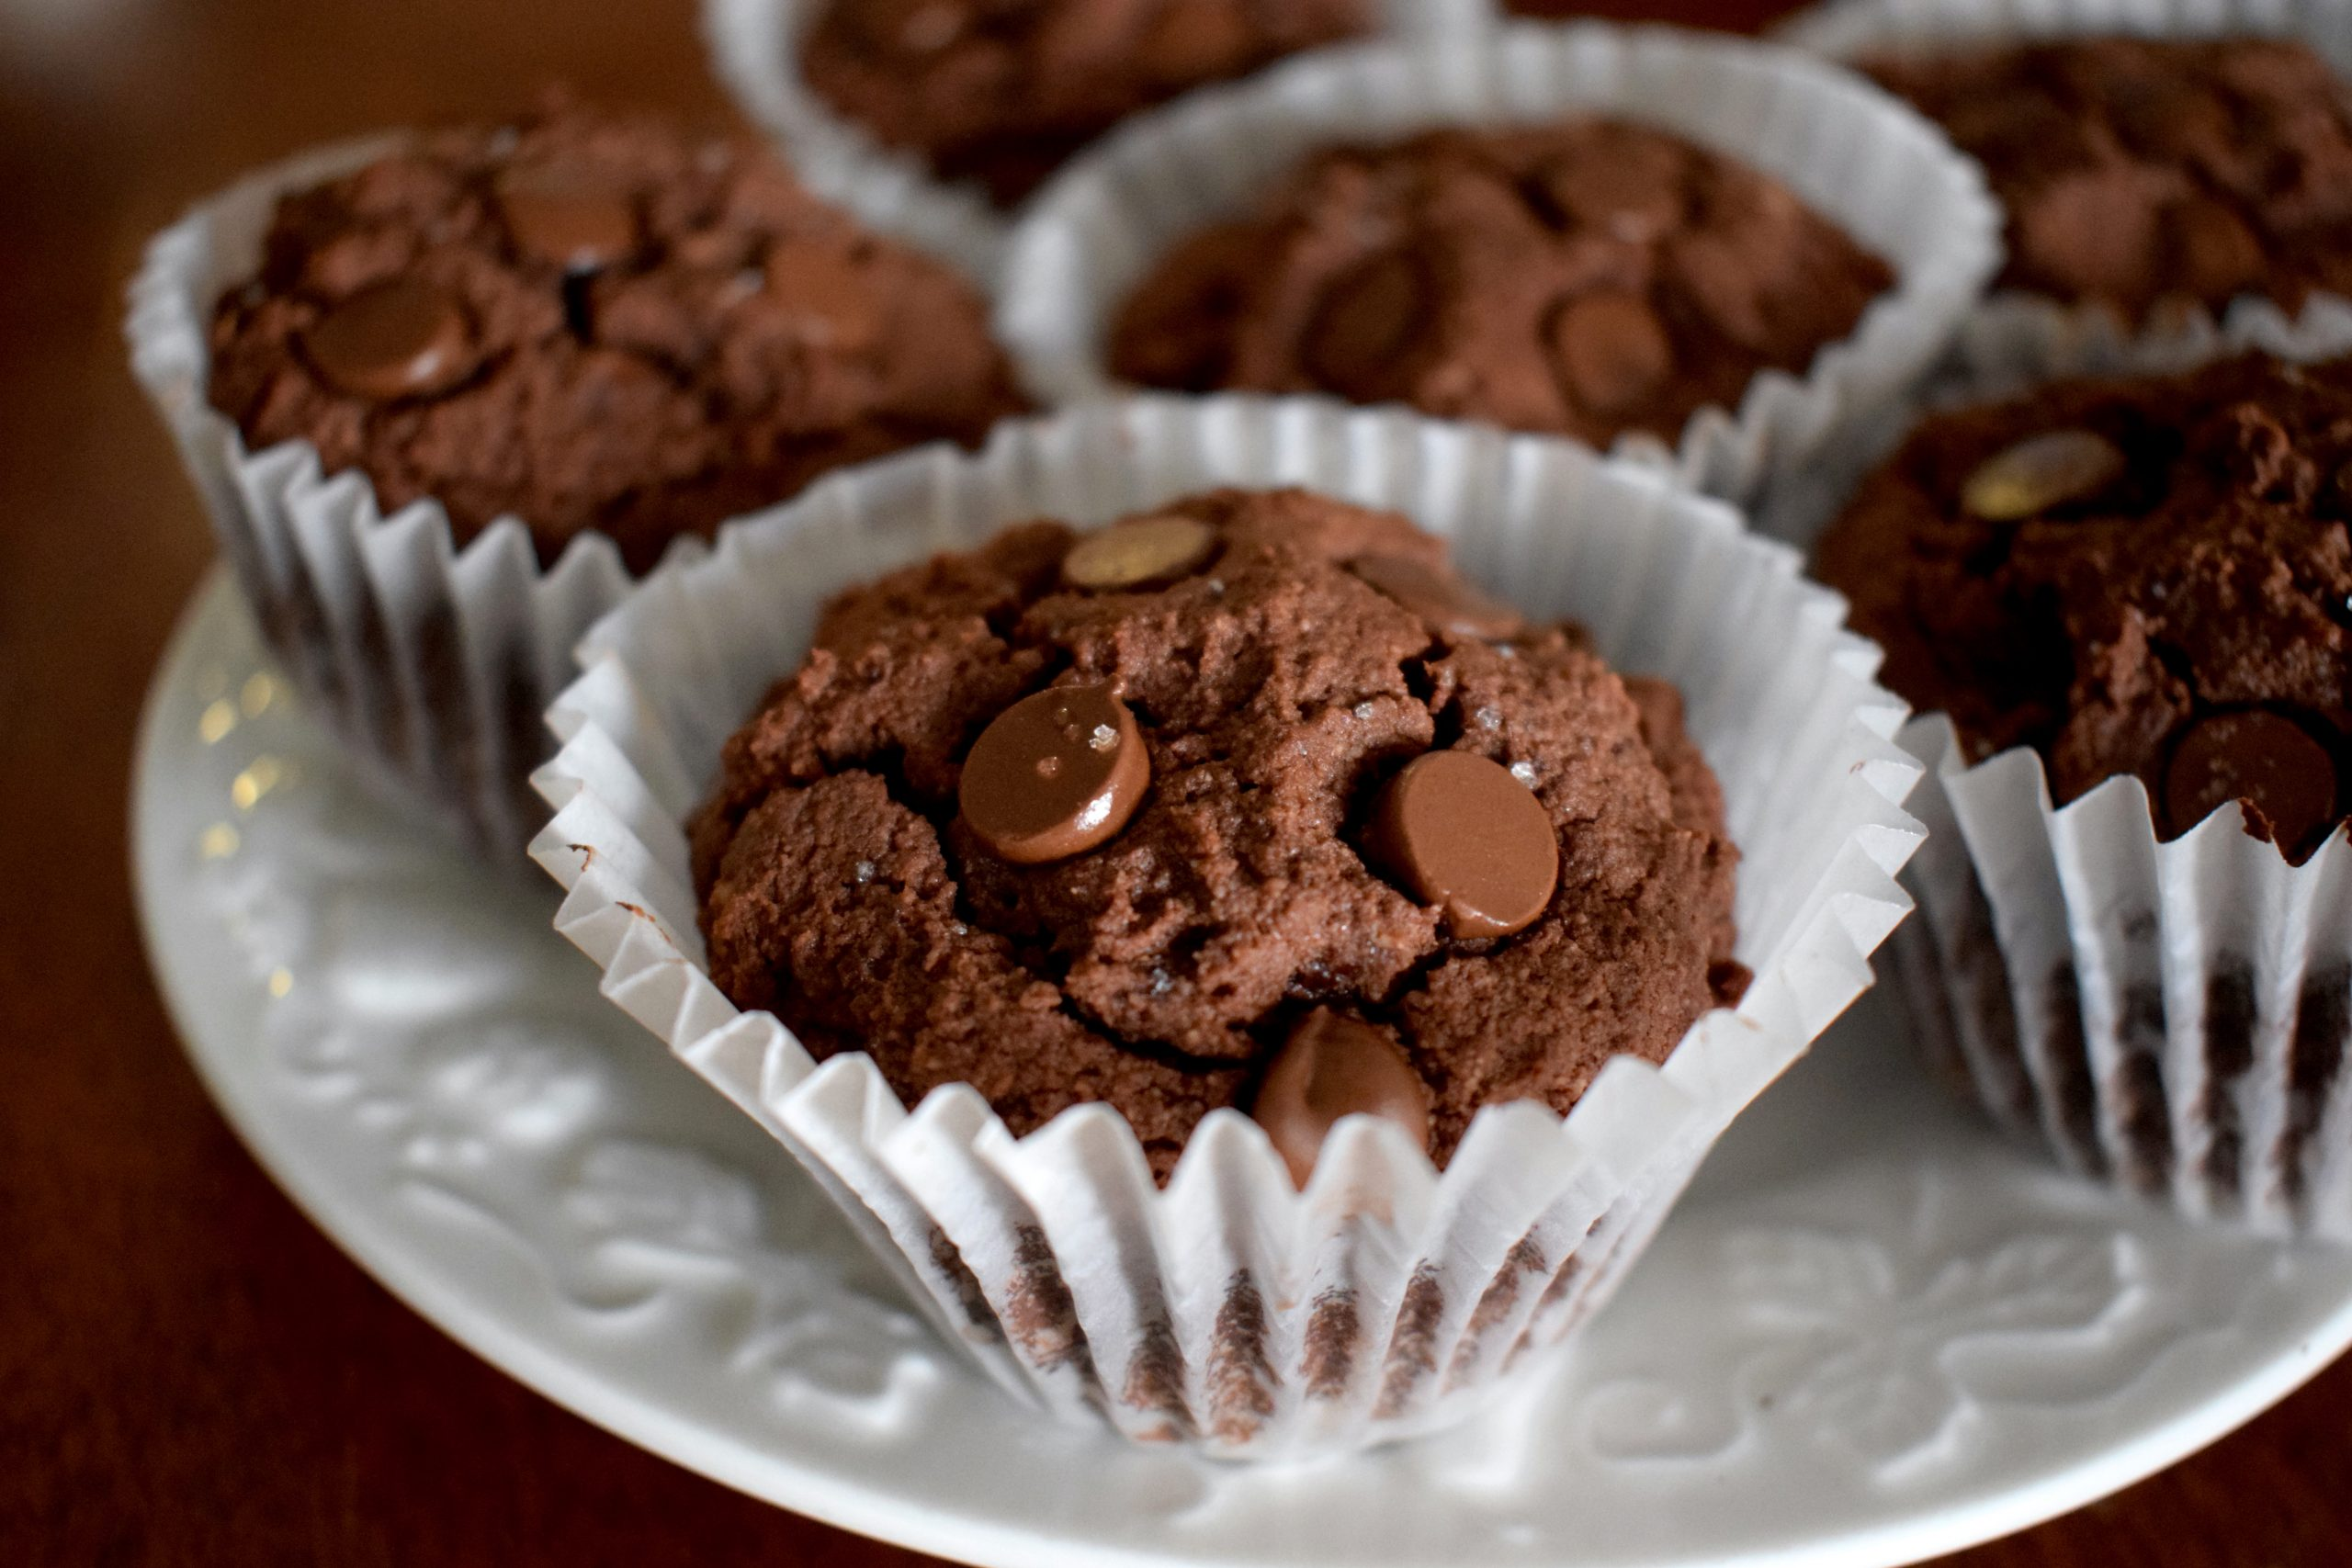 Keto Chocolate Bliss Muffins